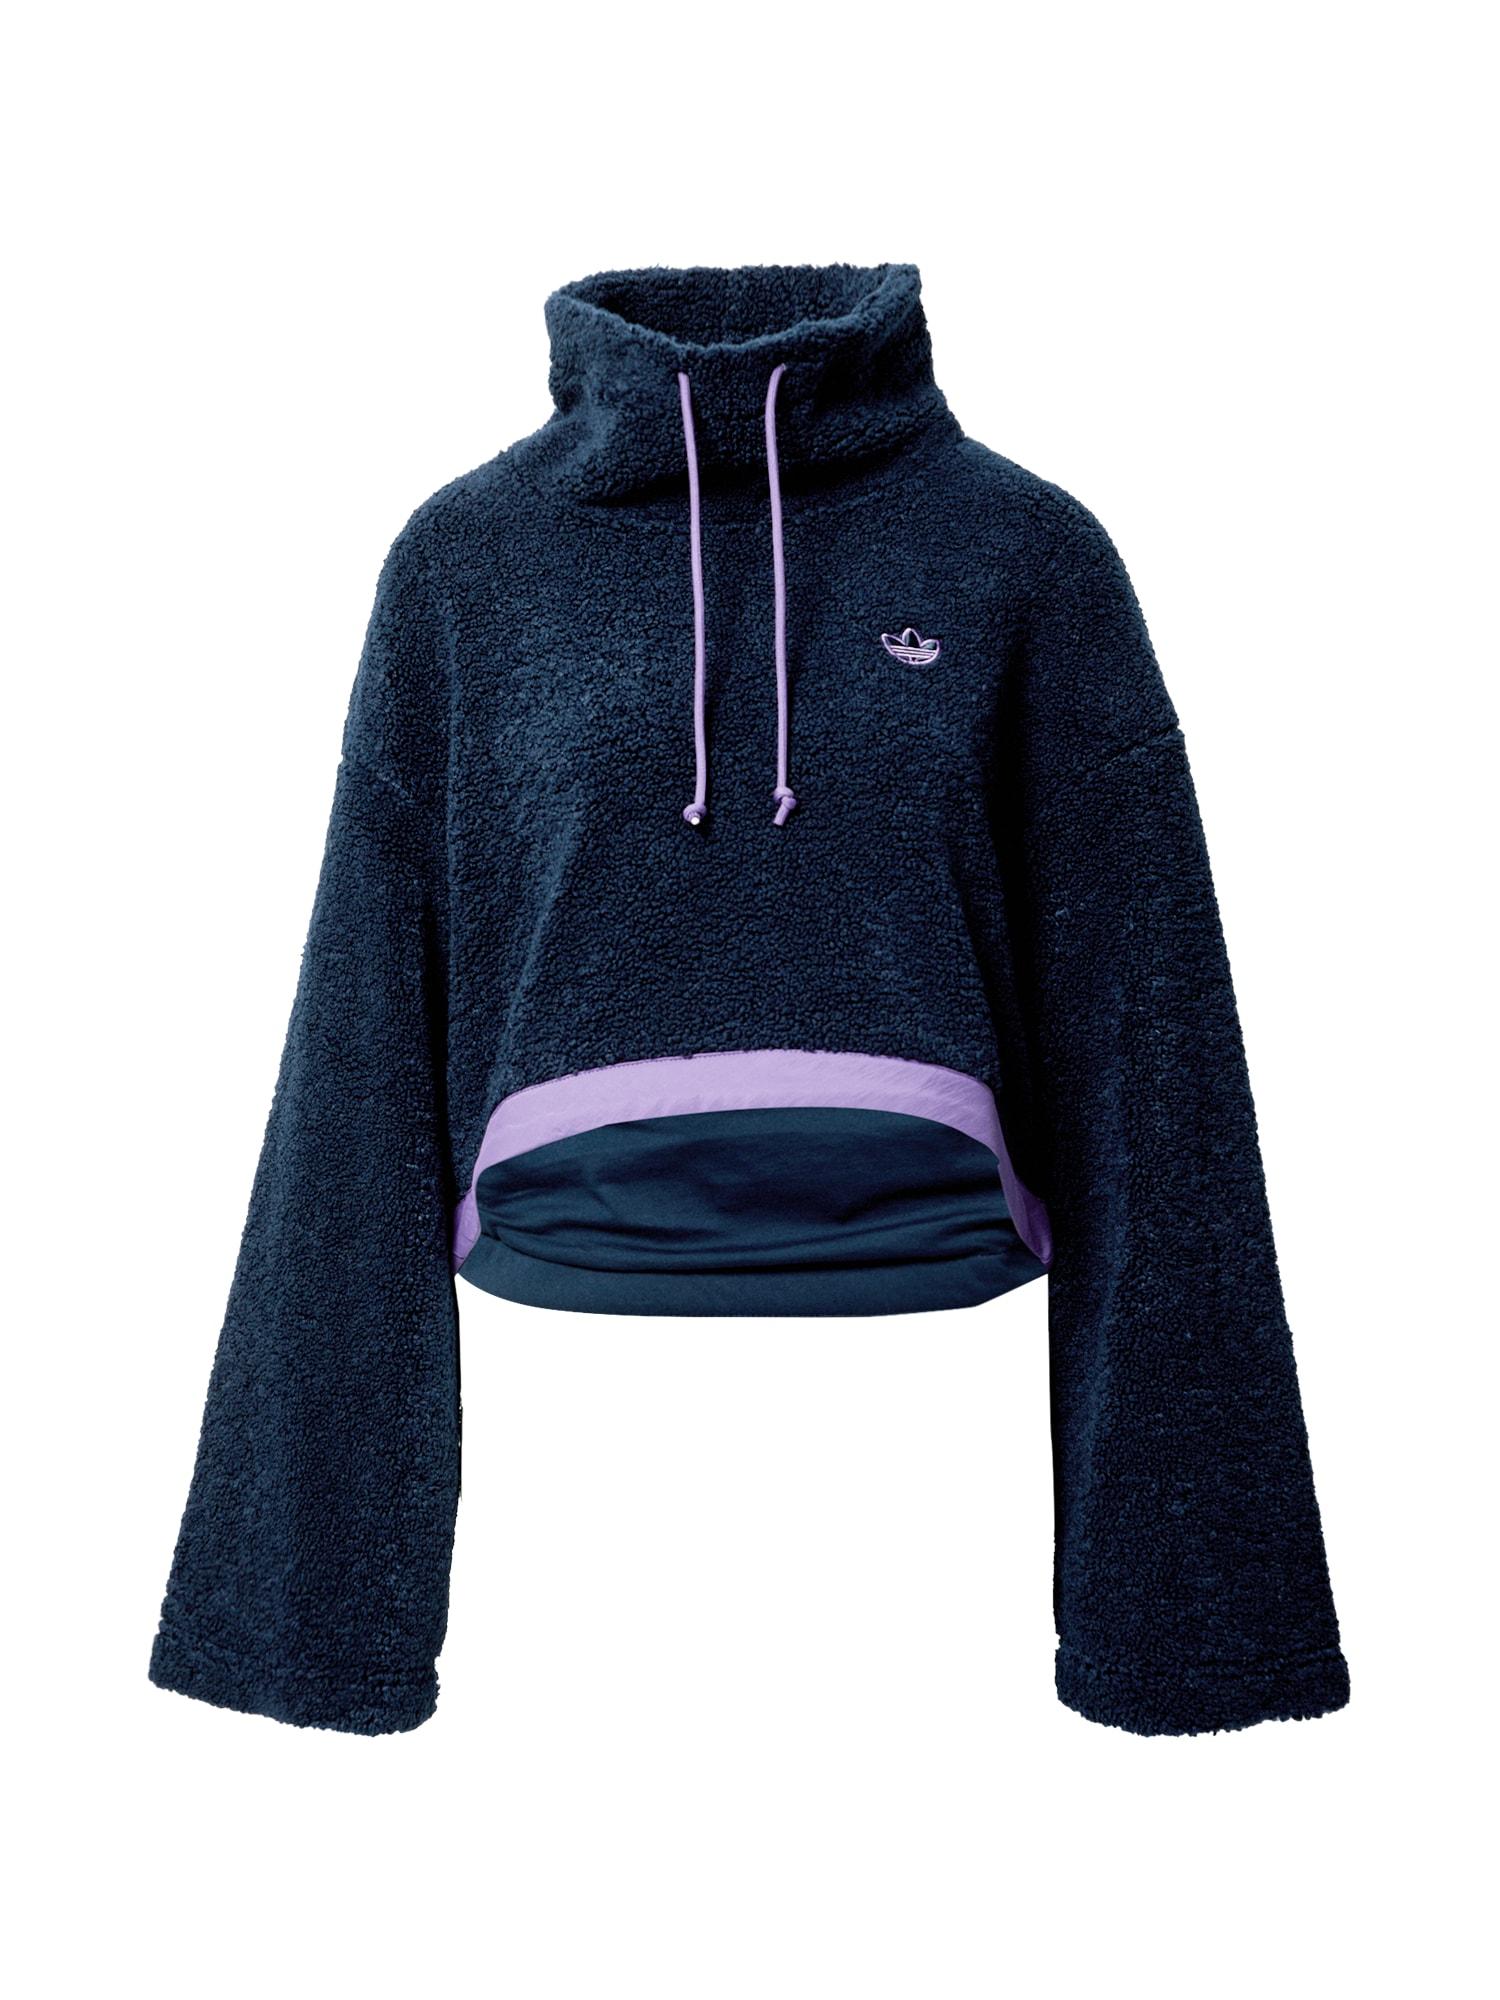 ADIDAS ORIGINALS Megztinis be užsegimo nakties mėlyna